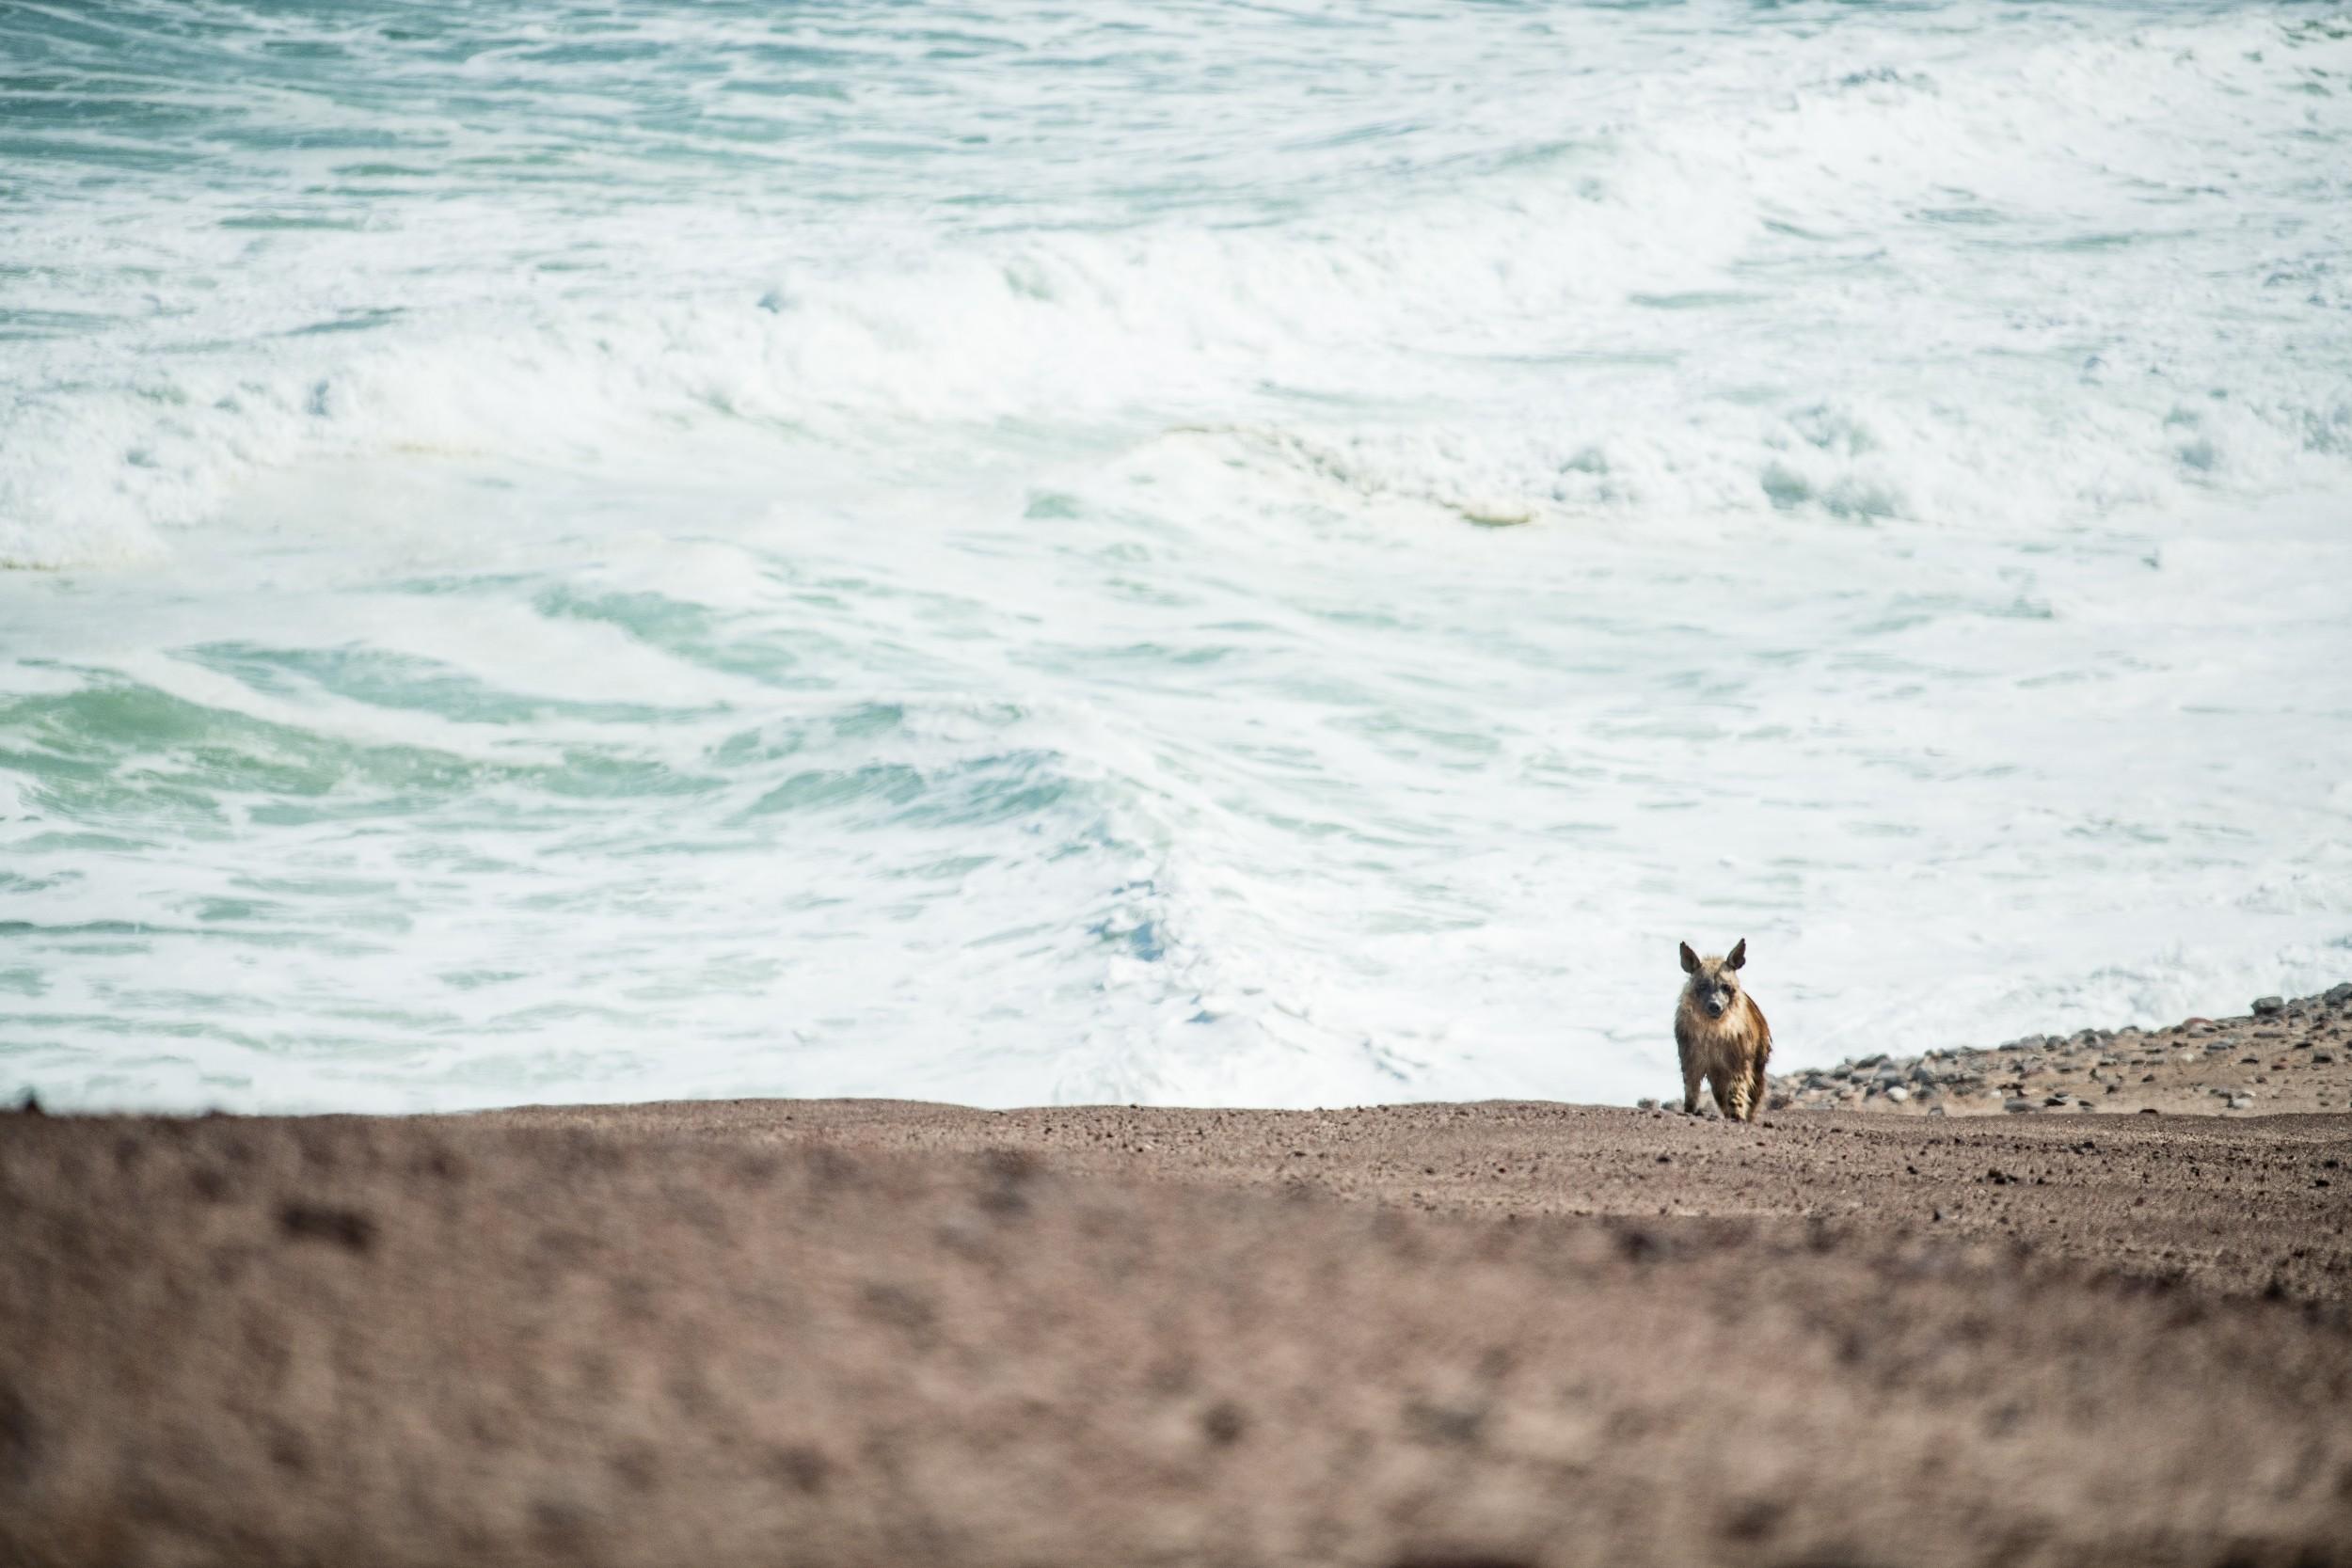 37Shipwreck Lodge - Brown hyena.jpg